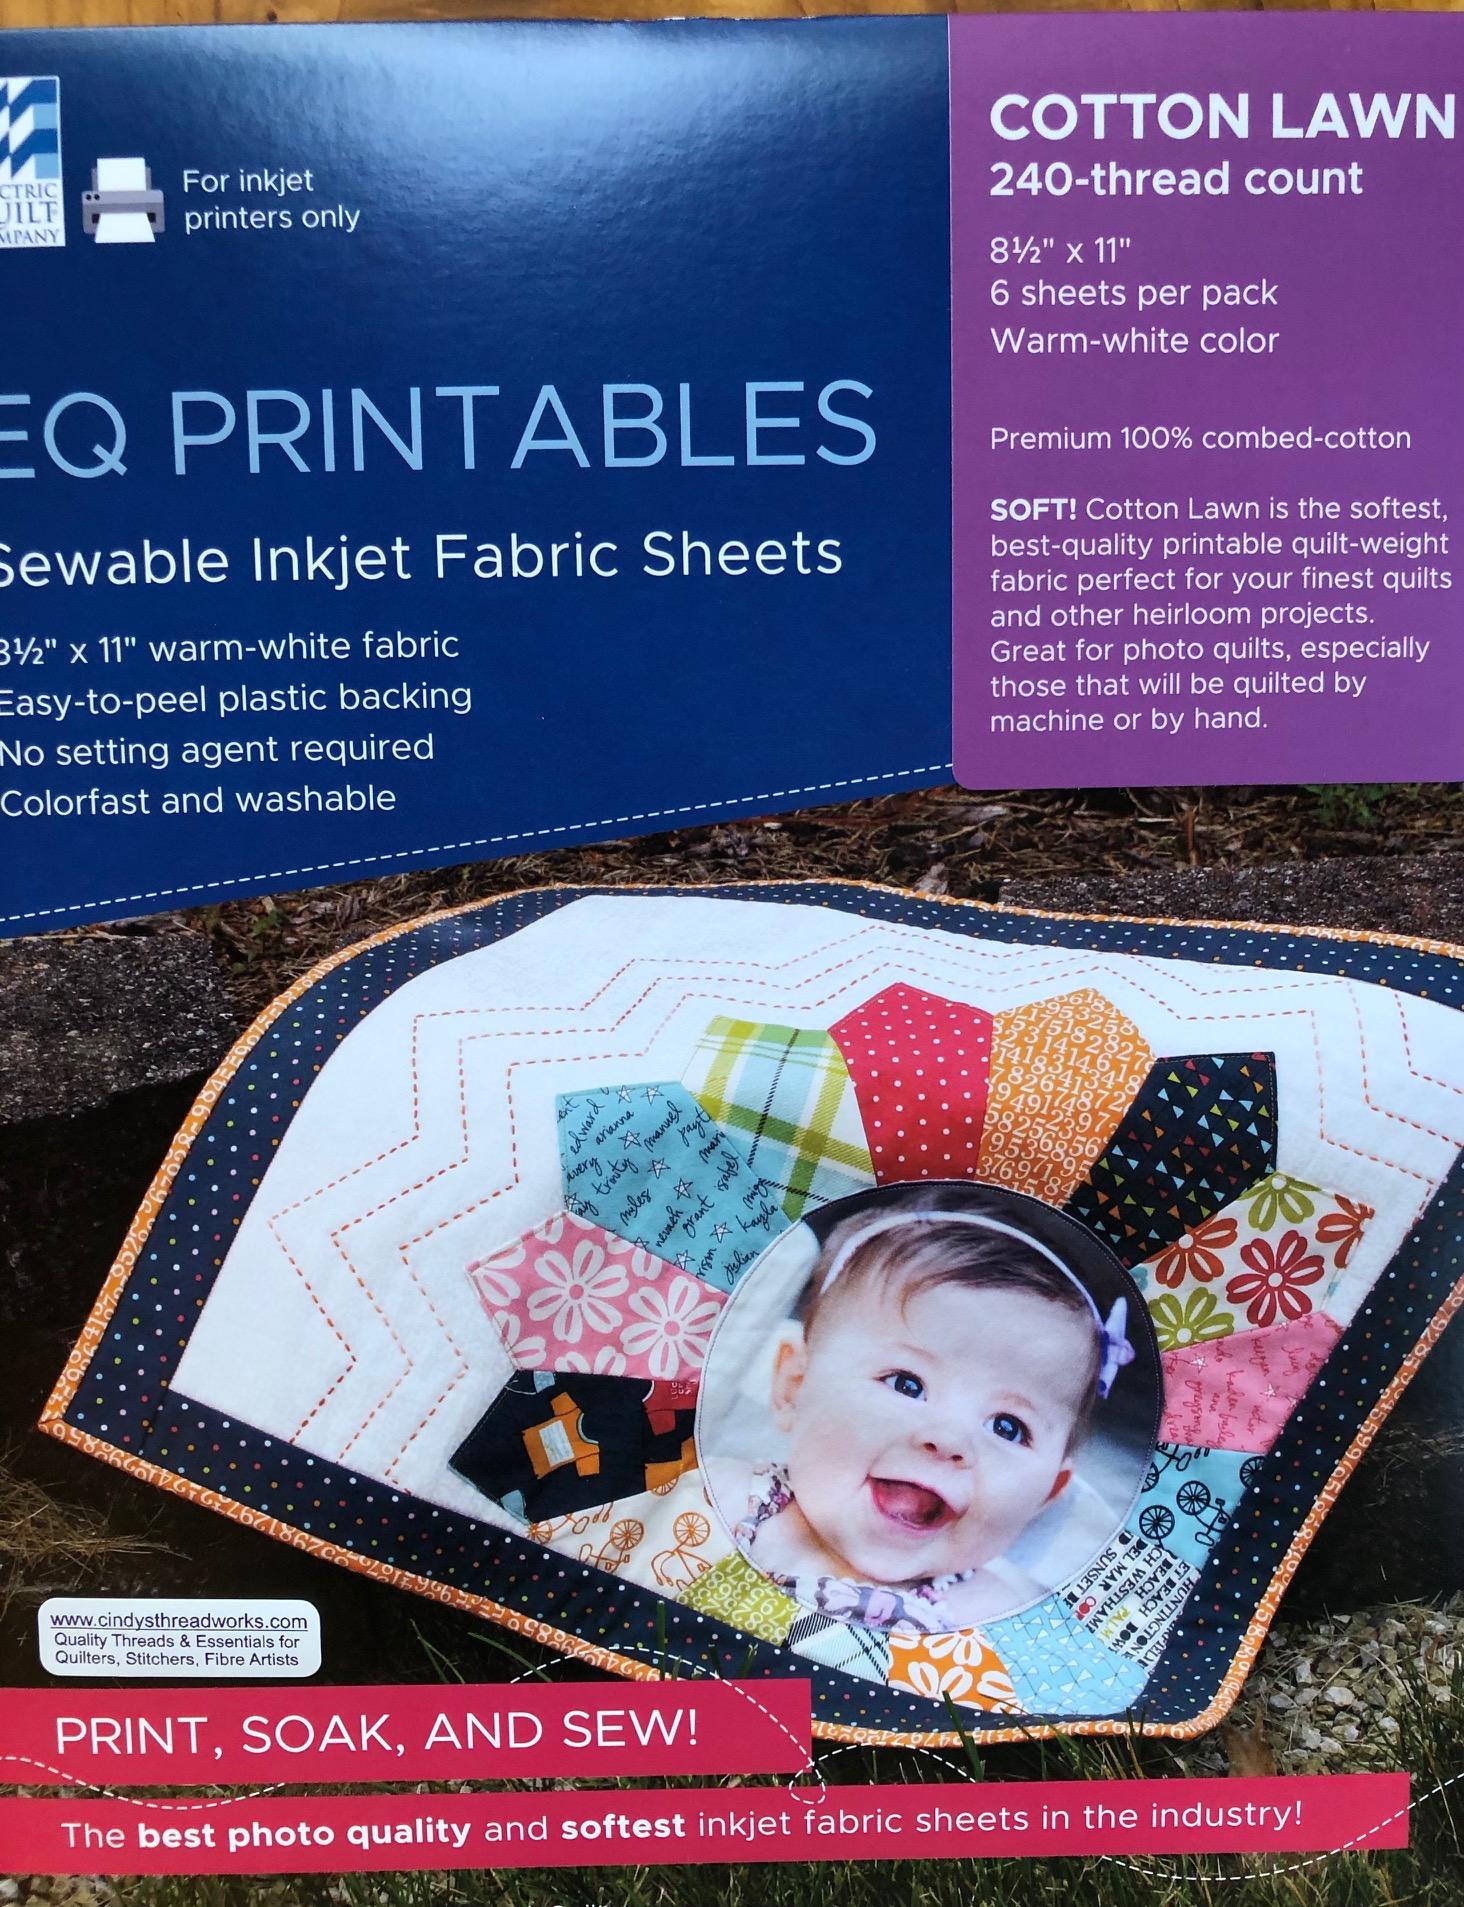 EQ Printable Fabric Sheets for Photos